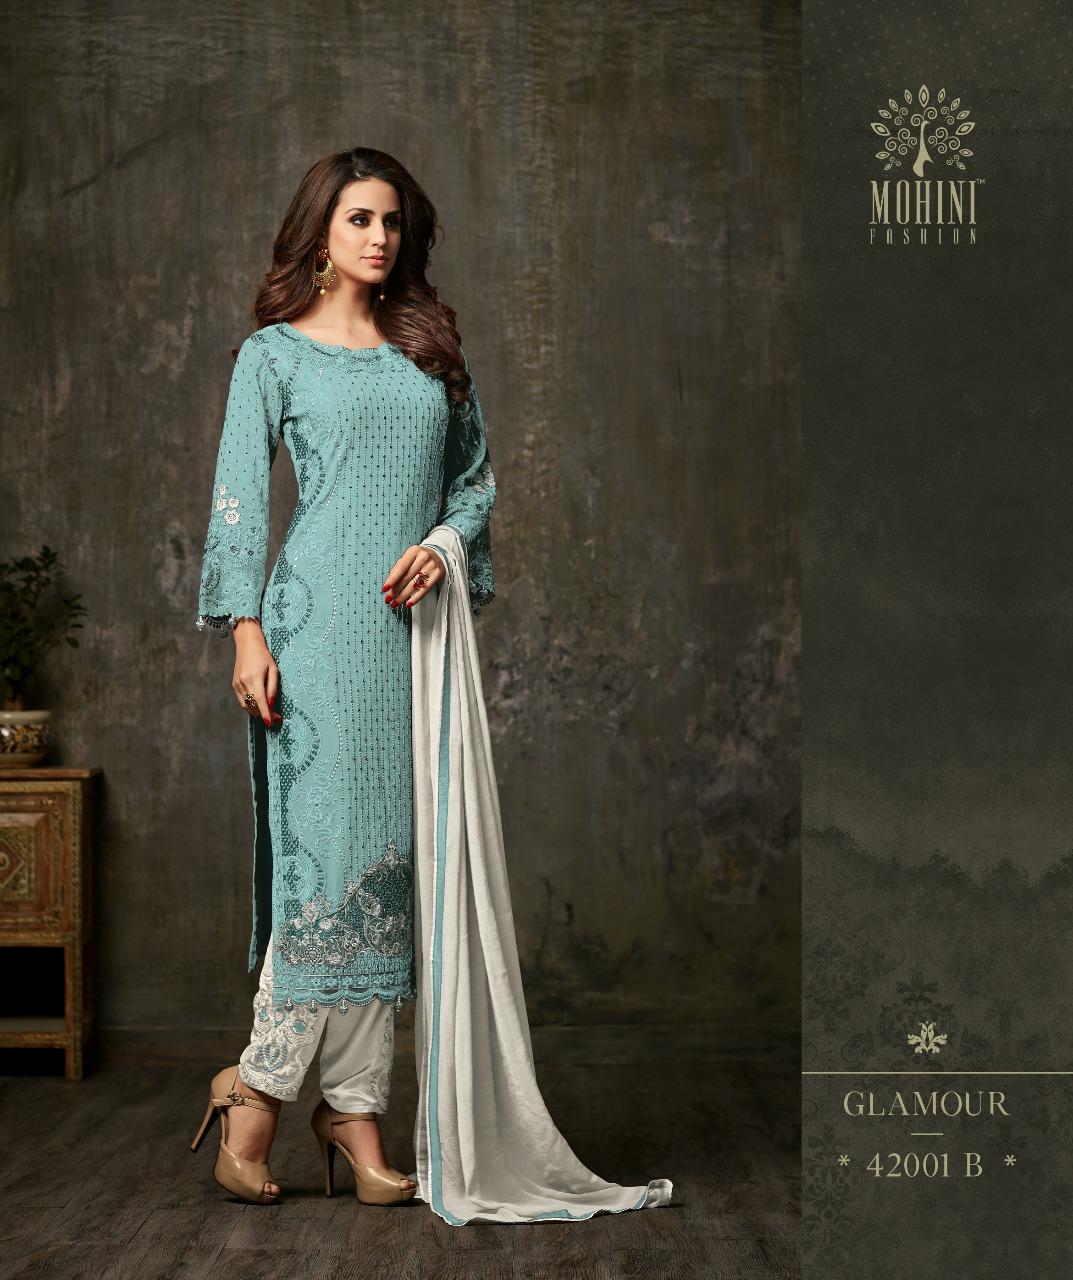 Mohini Fashion Glamour Vol 42 42001B BLUE